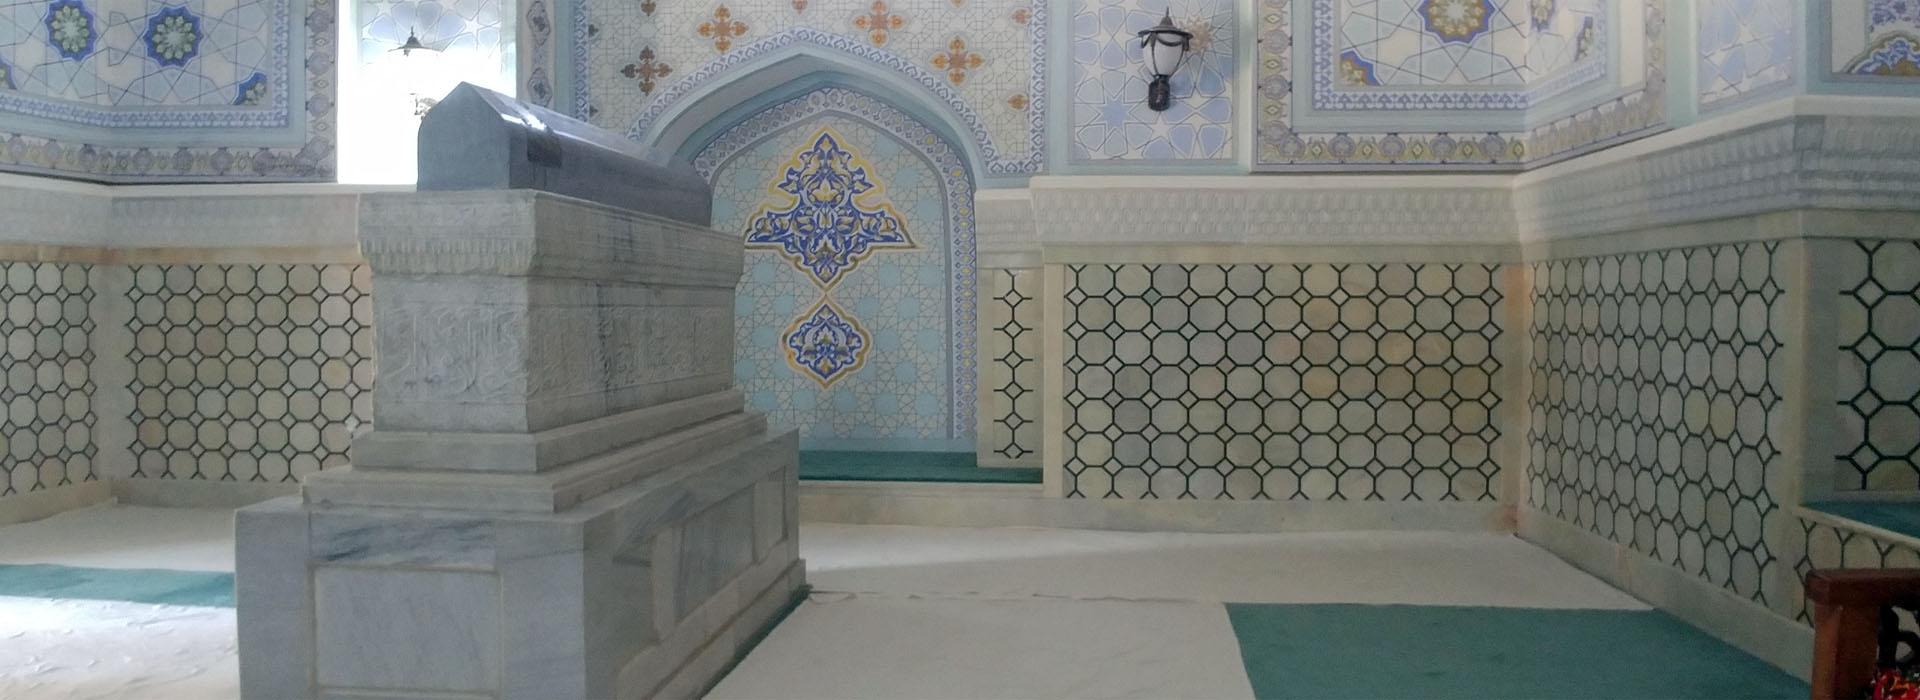 Sharisabz Mausoleum Uzbekistan Tour